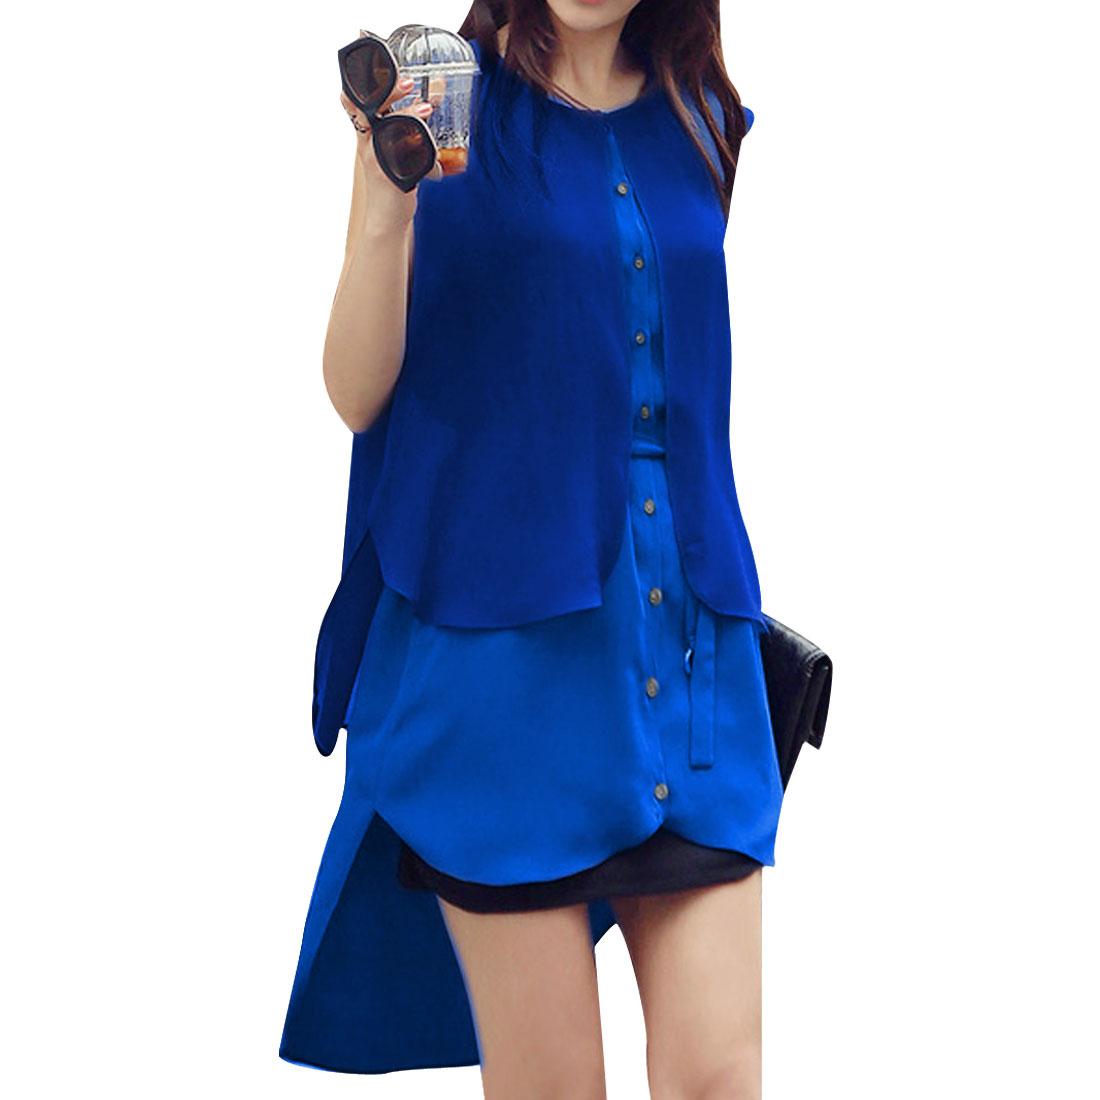 Ladies Sleeveless Dipped Hem Round Neck Modern Shirt Blue S